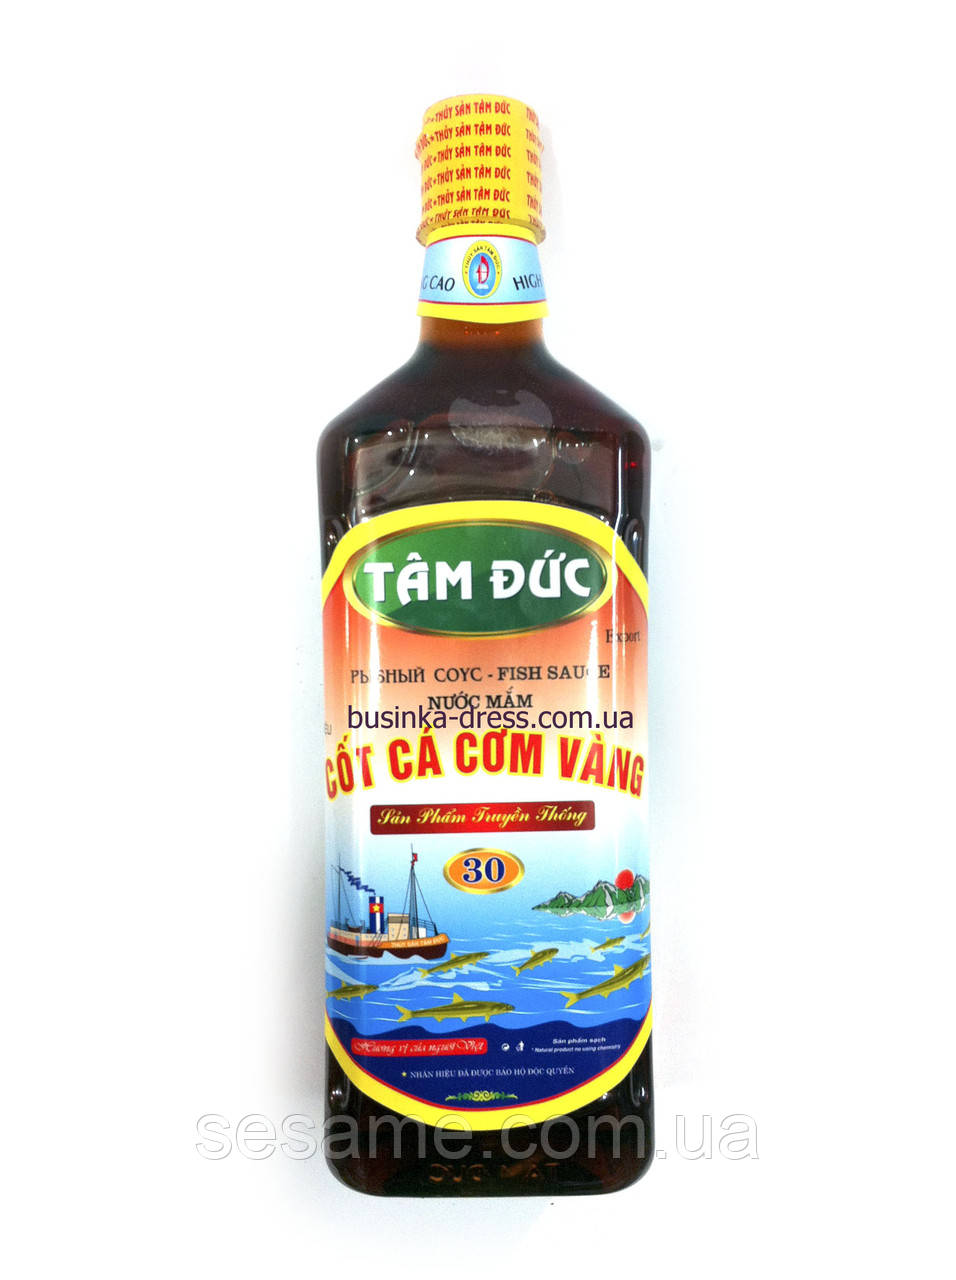 Рыбный соус Fish Sause NUOC MAM TAM DUC 30°,  900 ML. (Вьетнам)